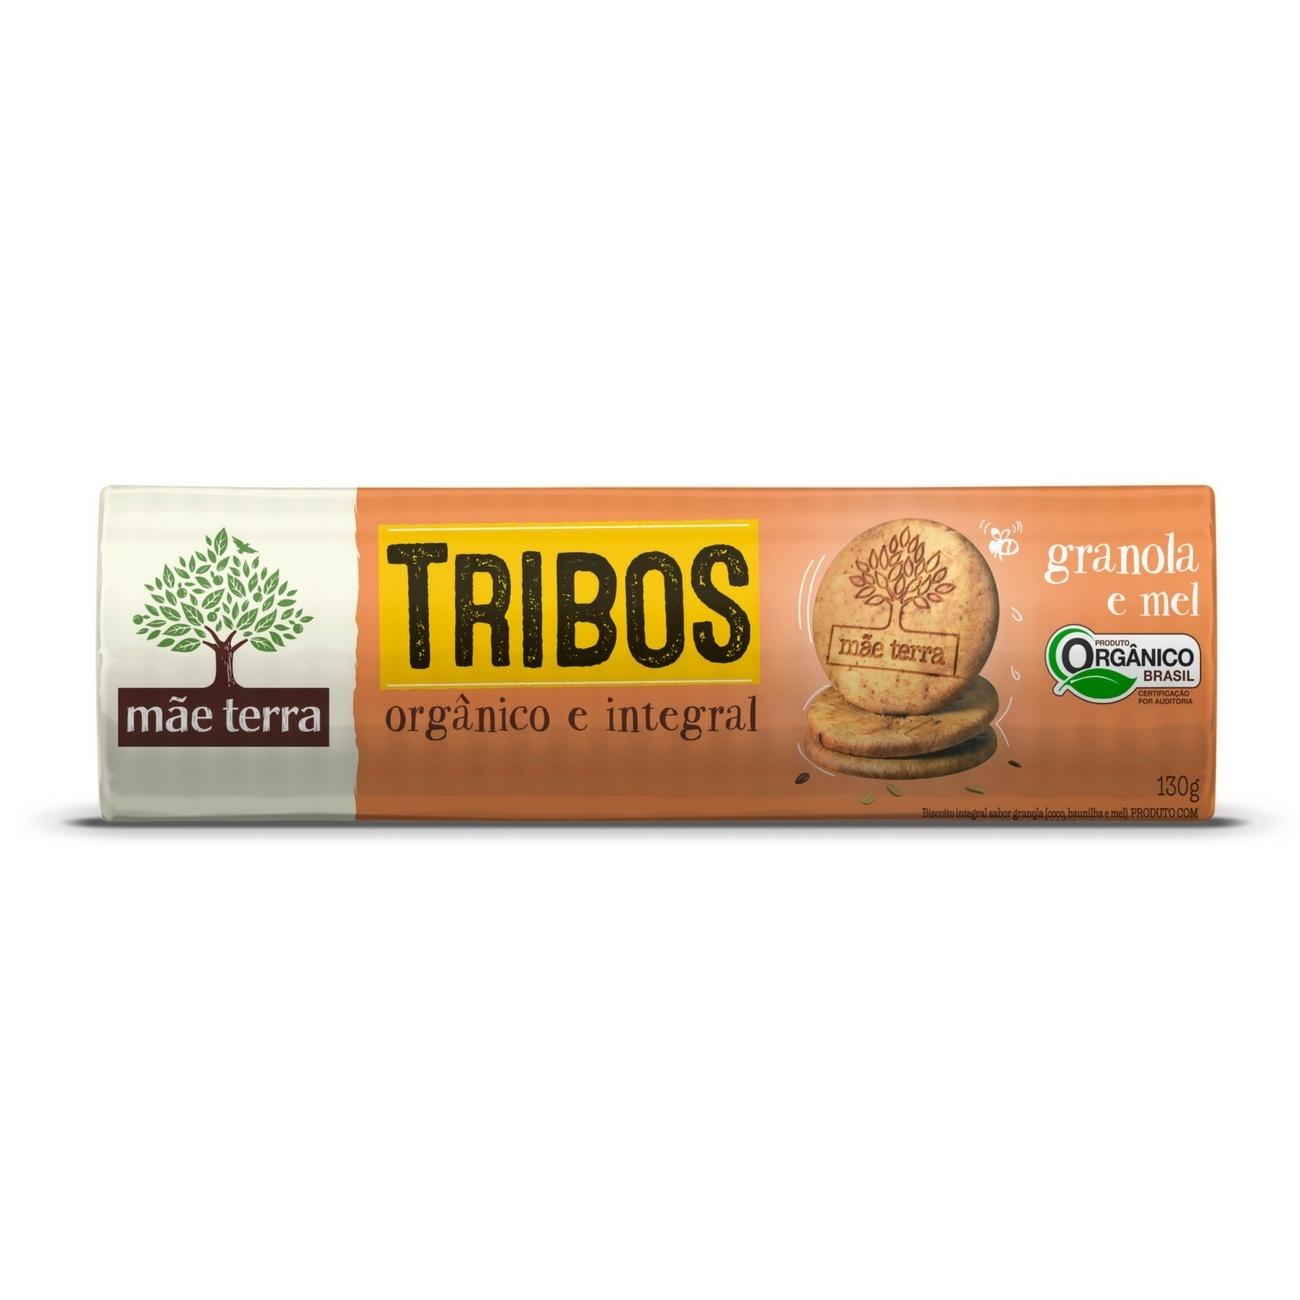 Biscoito Orgânico Tribos Granola 130g